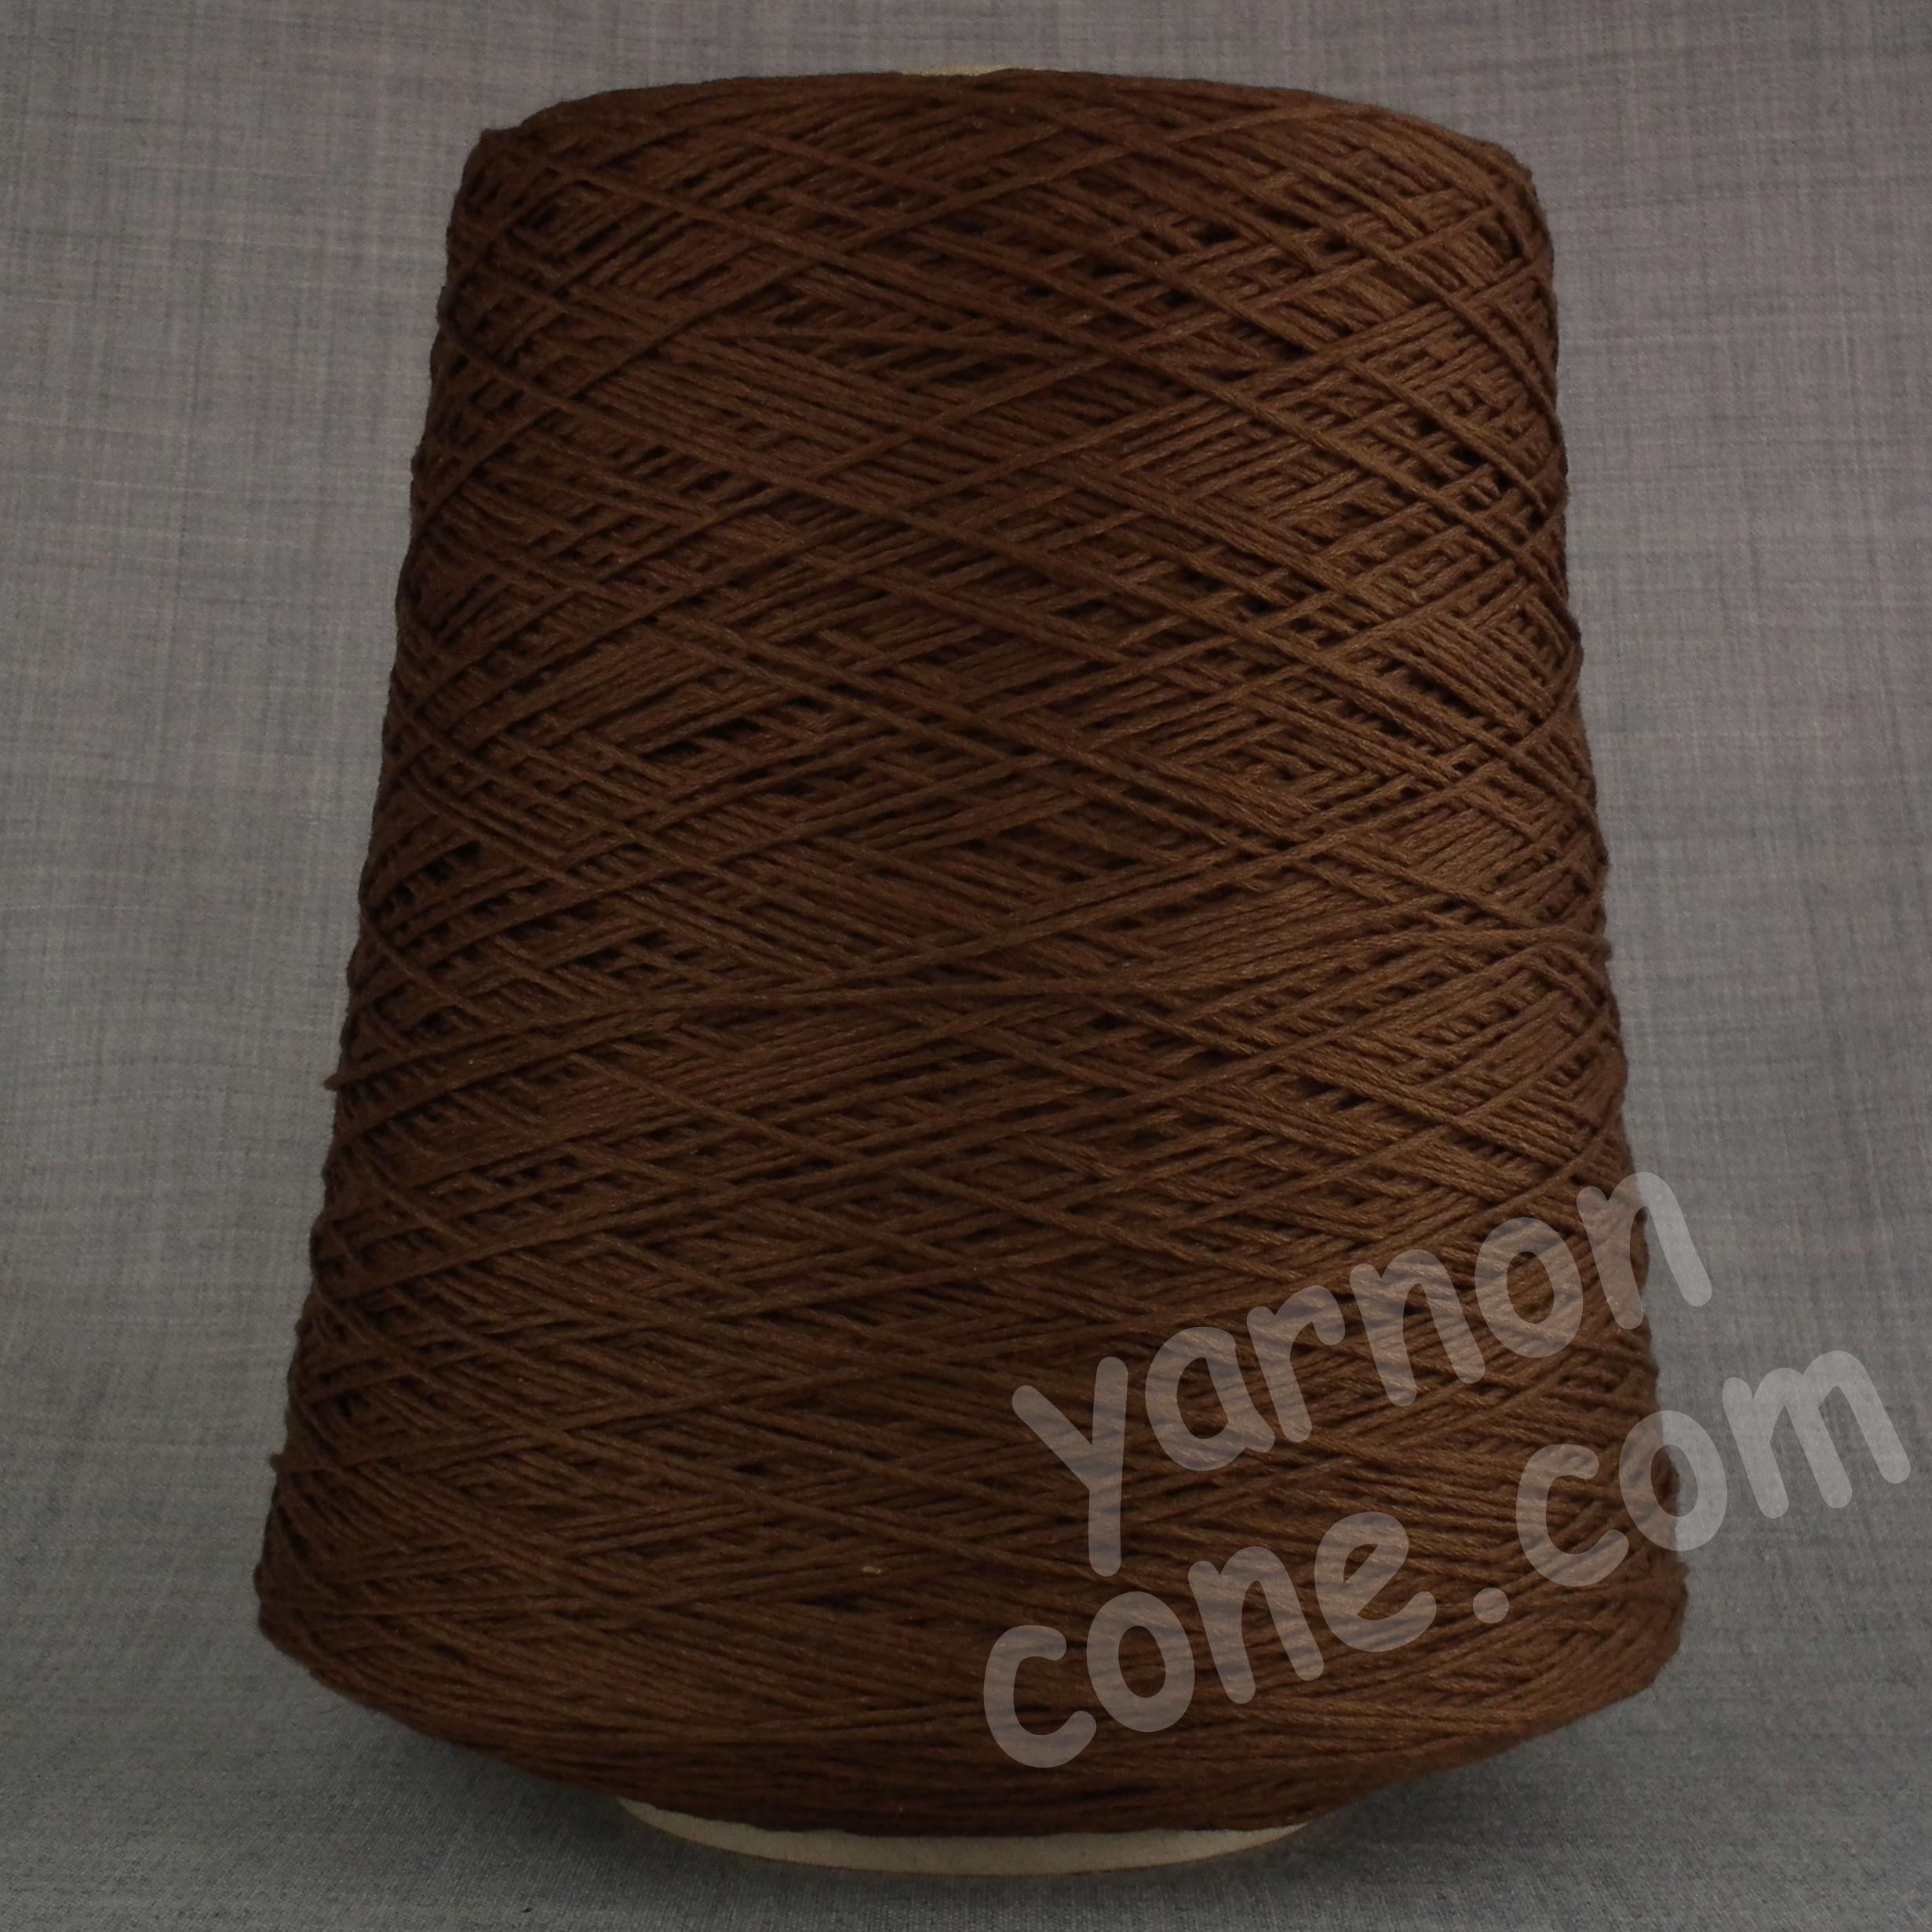 cashmere cotton soft yarn on cone 4 ply knitting weaving crochet luxury UK chocolate brown